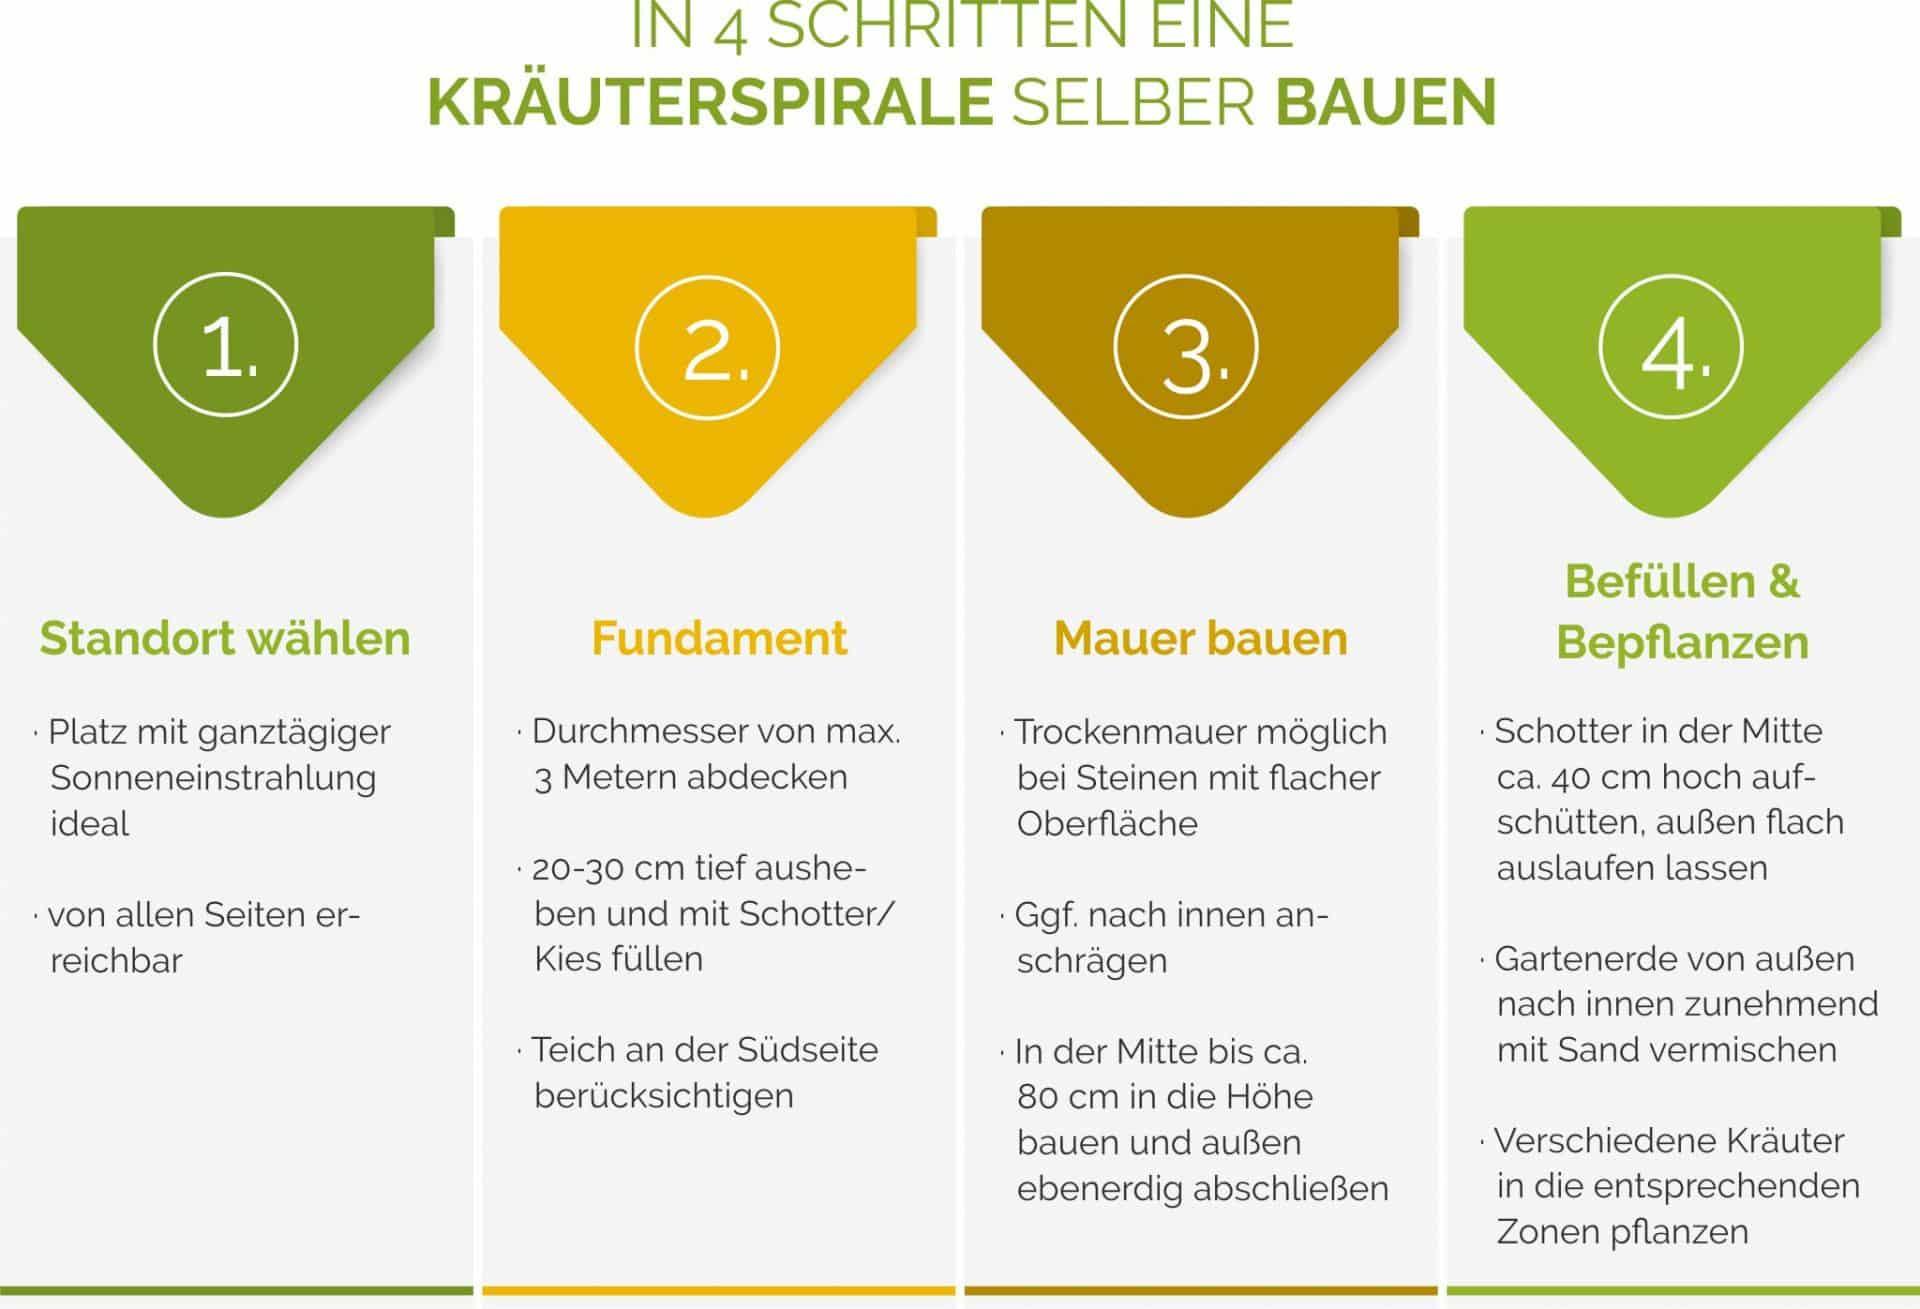 kraeuterspirale_anlegen_anleitung_selber_bauen